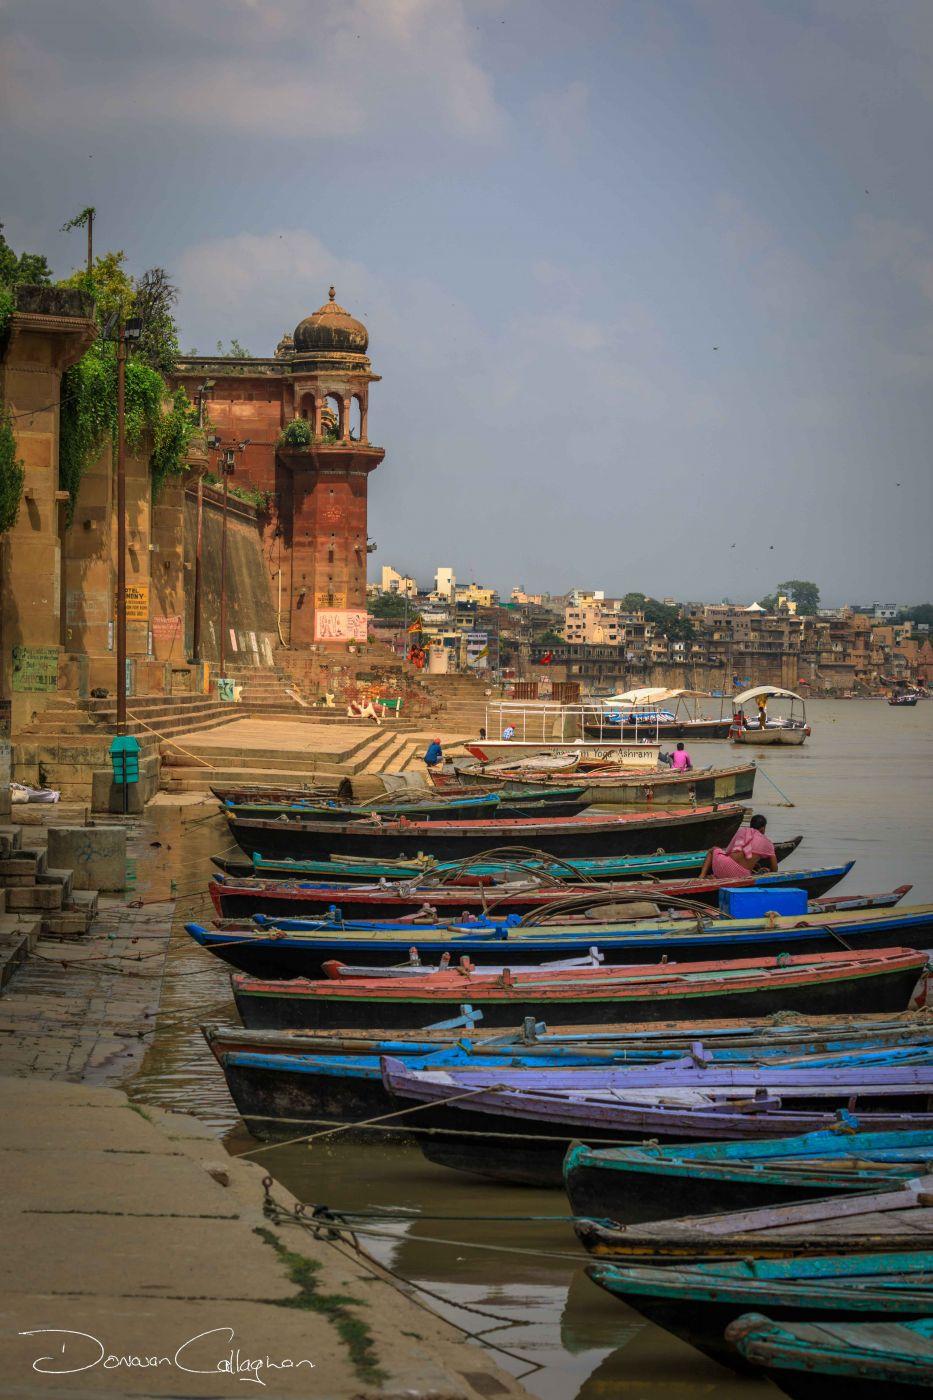 Boats on the Ganges Varanasi, India